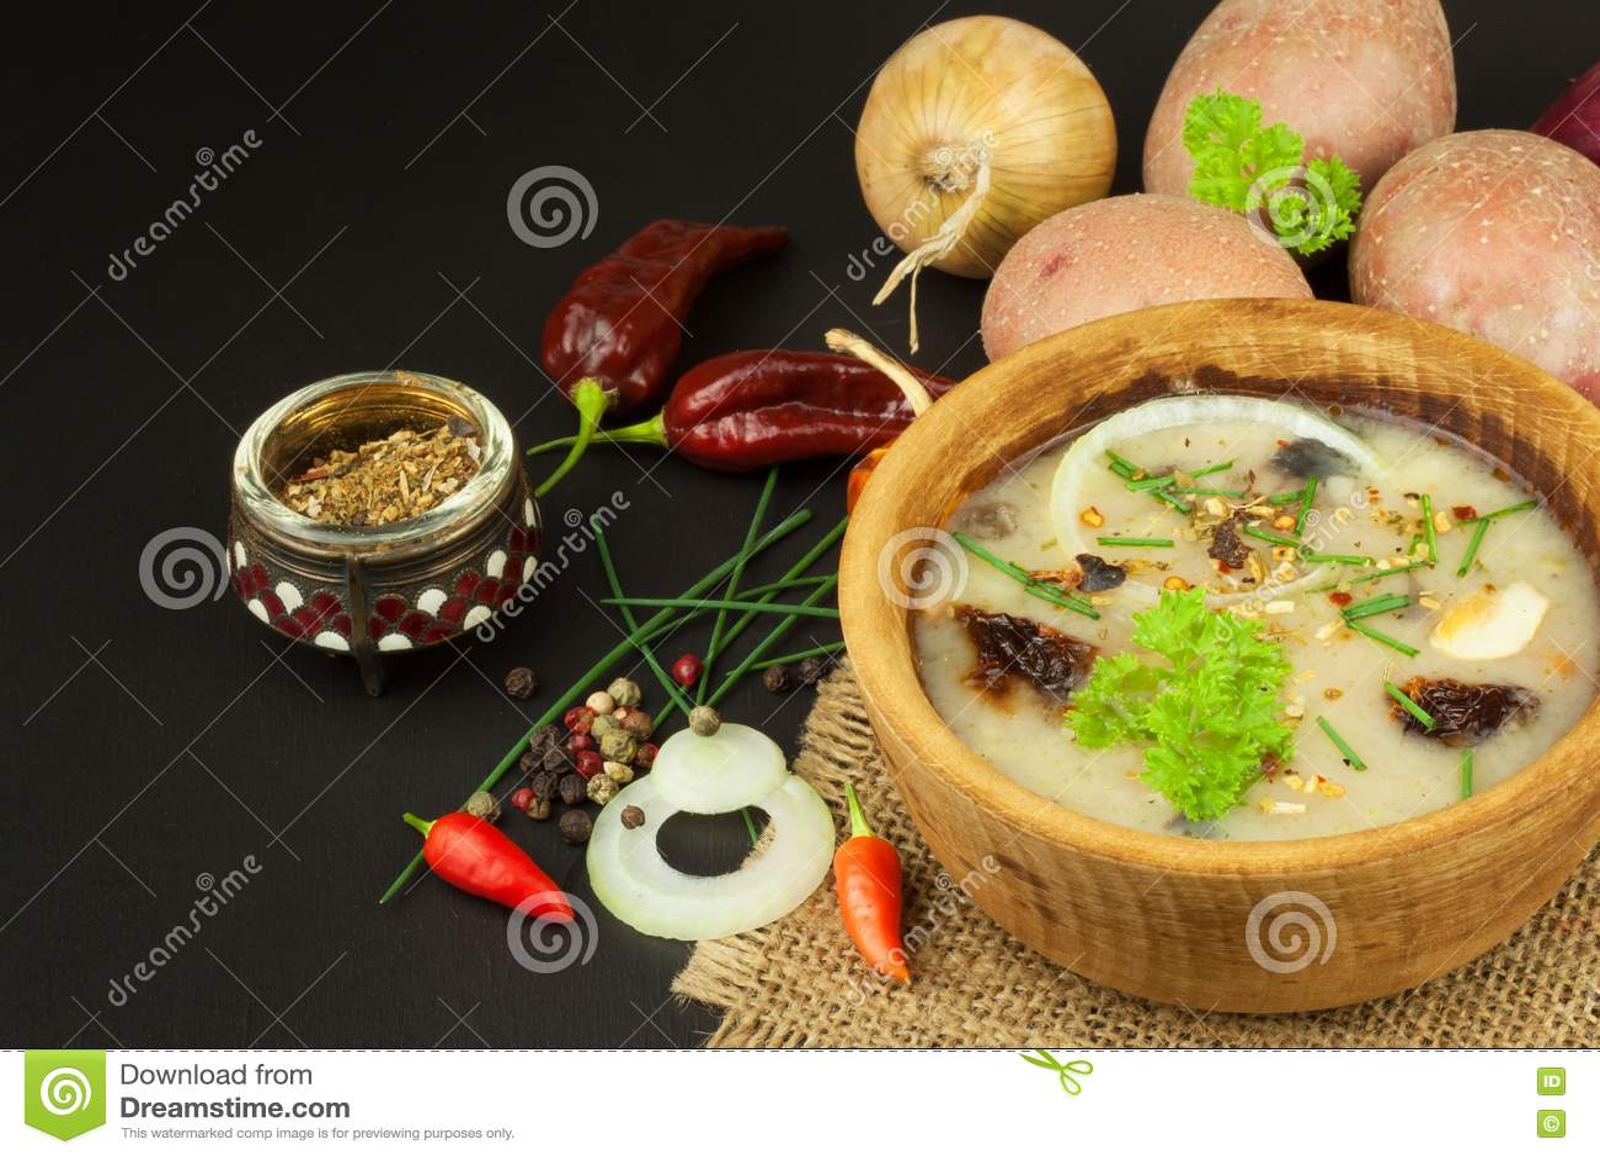 kitchen prep table how to clean silgranit sinks 自创土豆汤用蘑菇碗用在木桌上的土豆汤食物例证厨房准备向量妇女库存照片 自创土豆汤用蘑菇碗用在木桌上的土豆汤食物